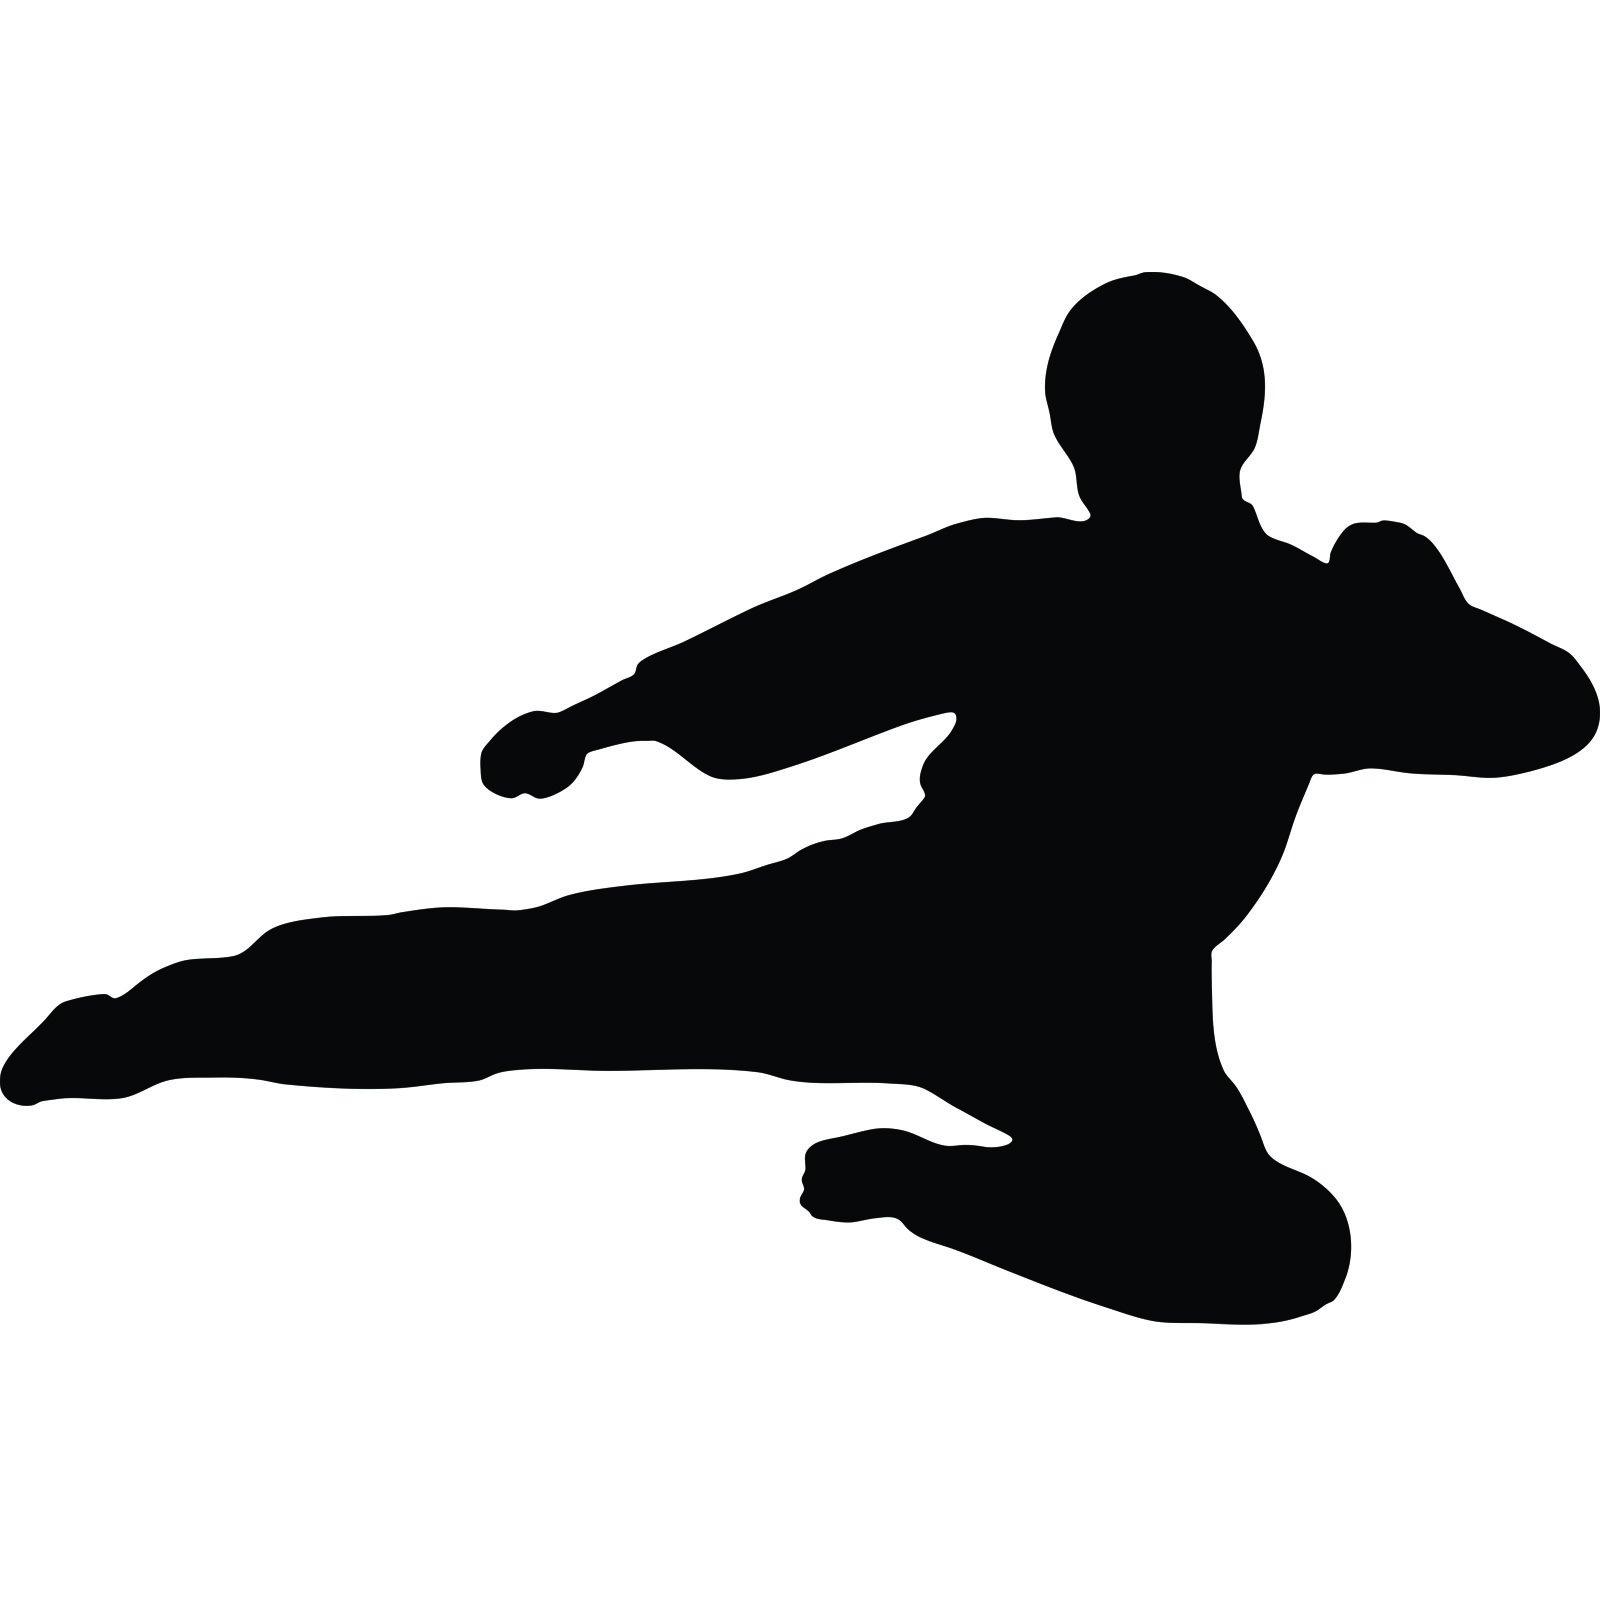 Flying karate kick silhouette www galleryhip com the